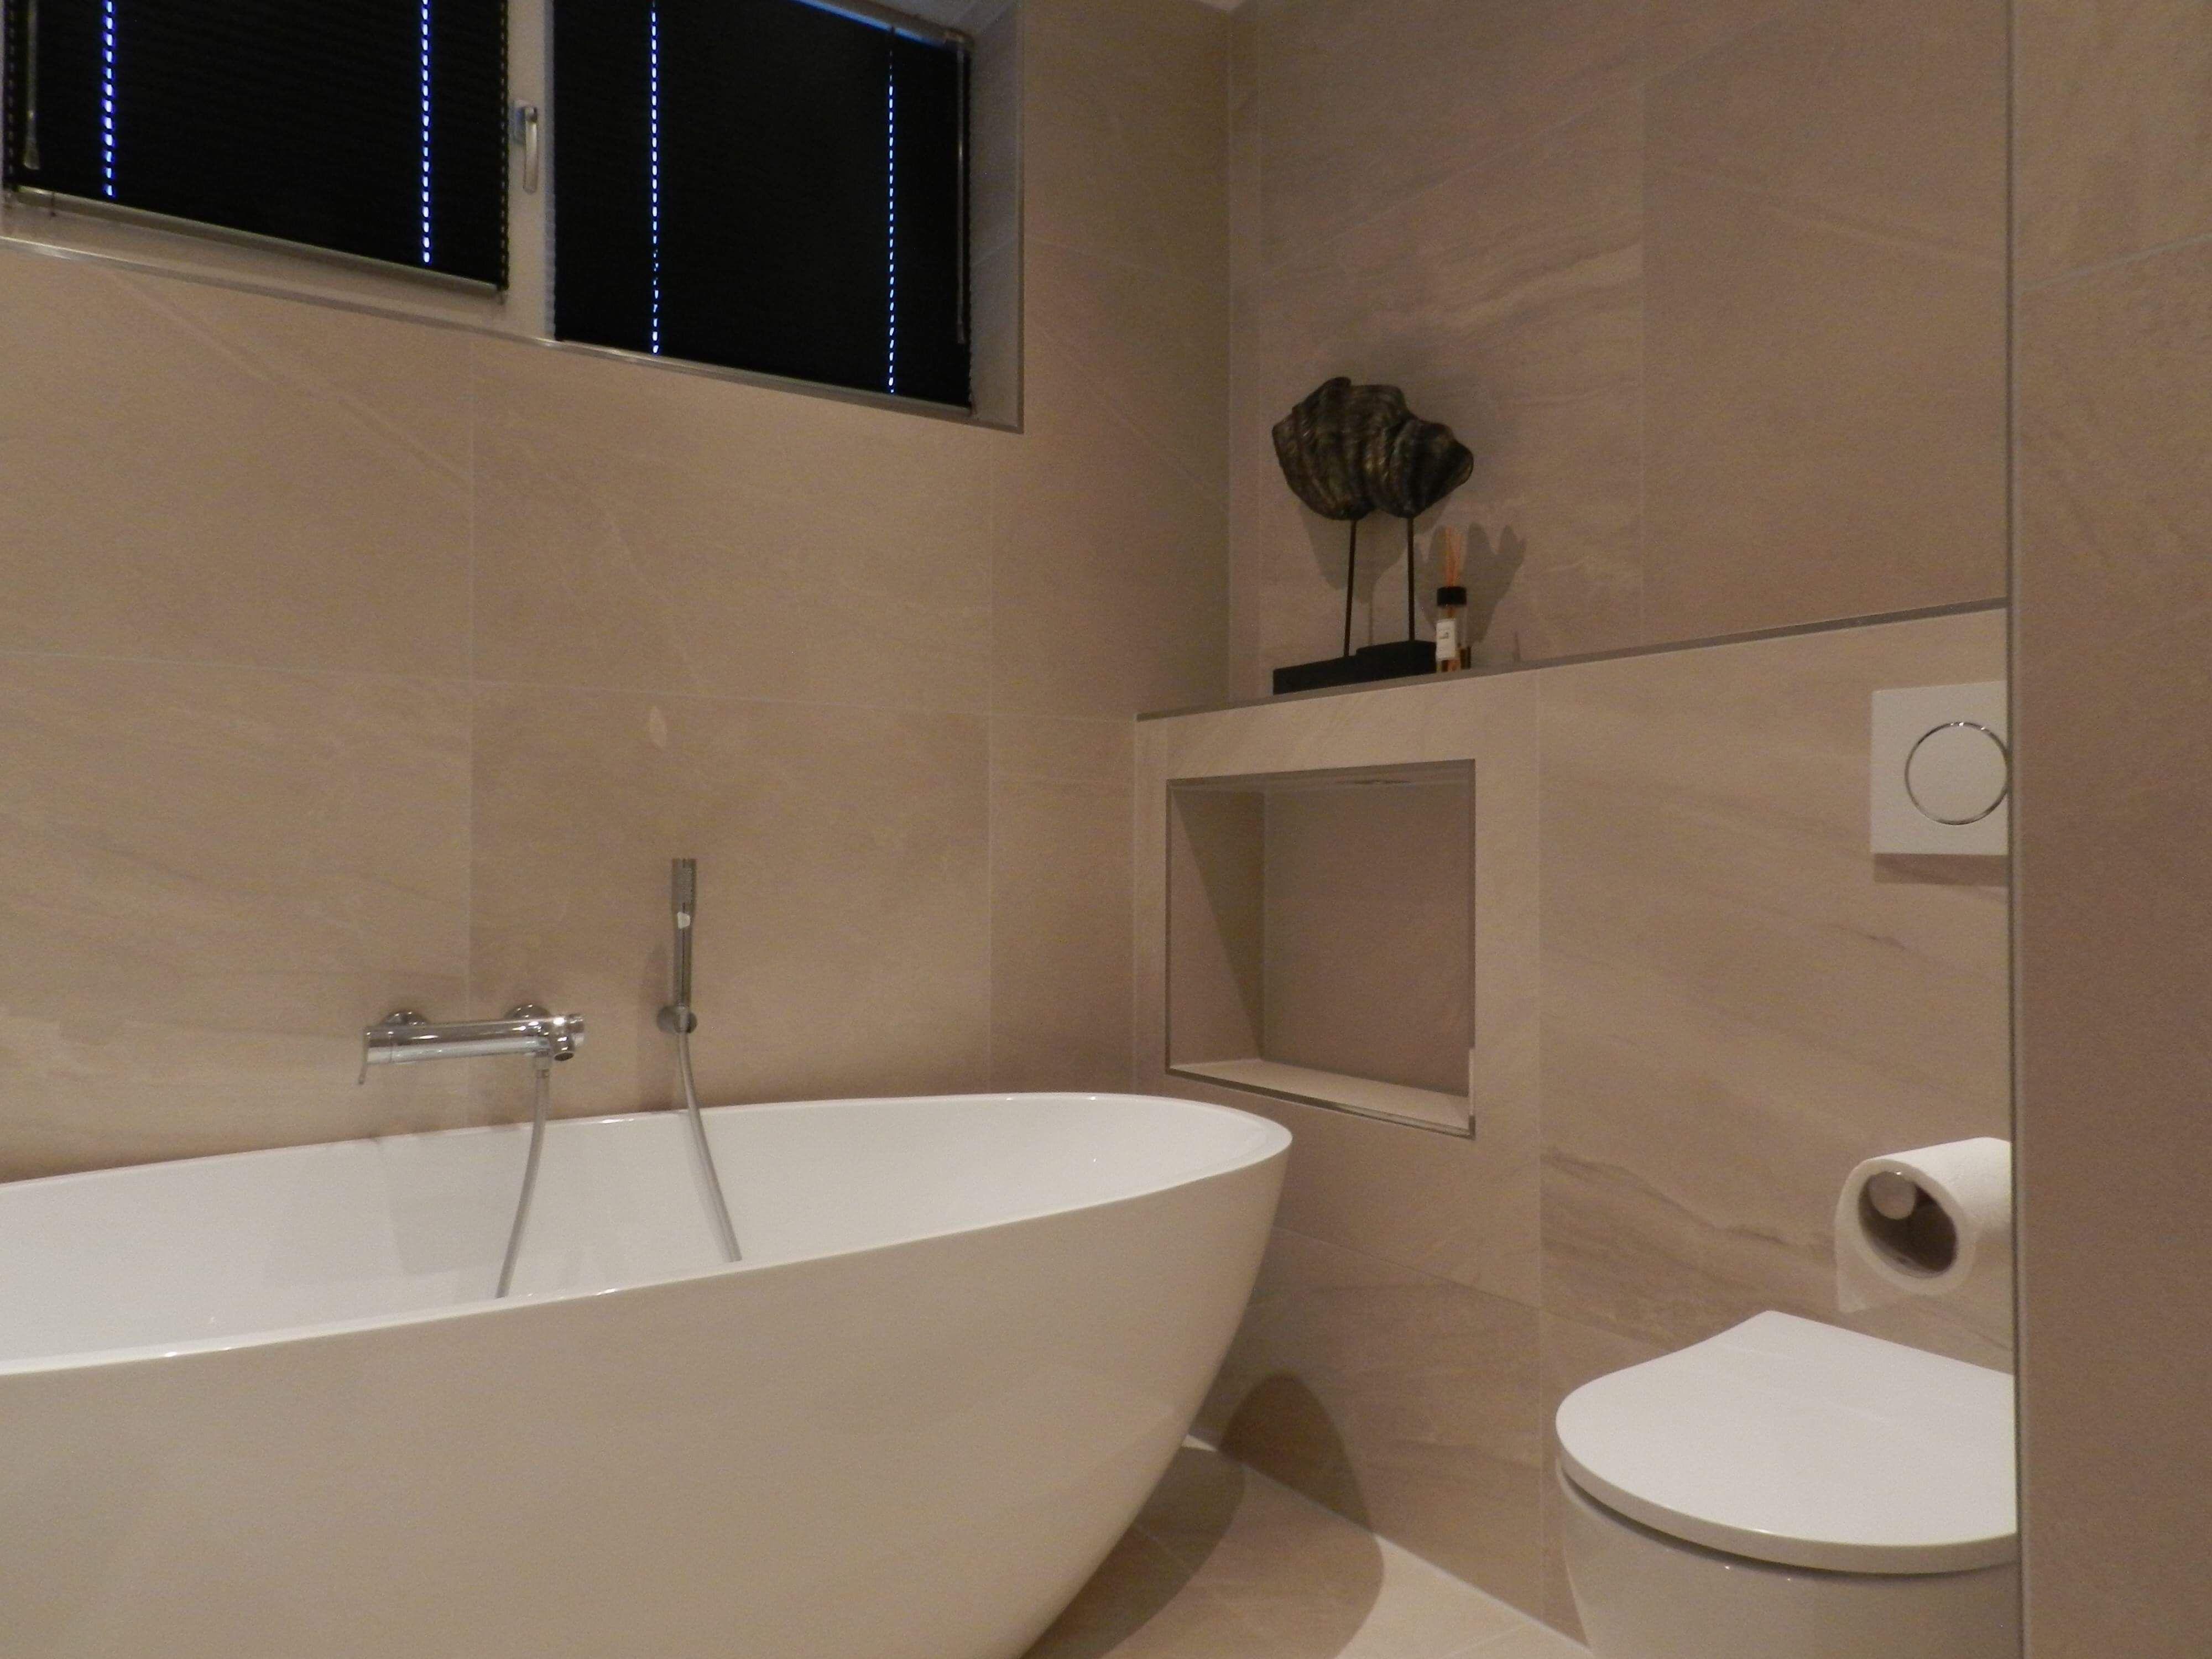 Badkamer Lichte Tegels : Strakke badkamer met lichte tegels stobastone in bathroom